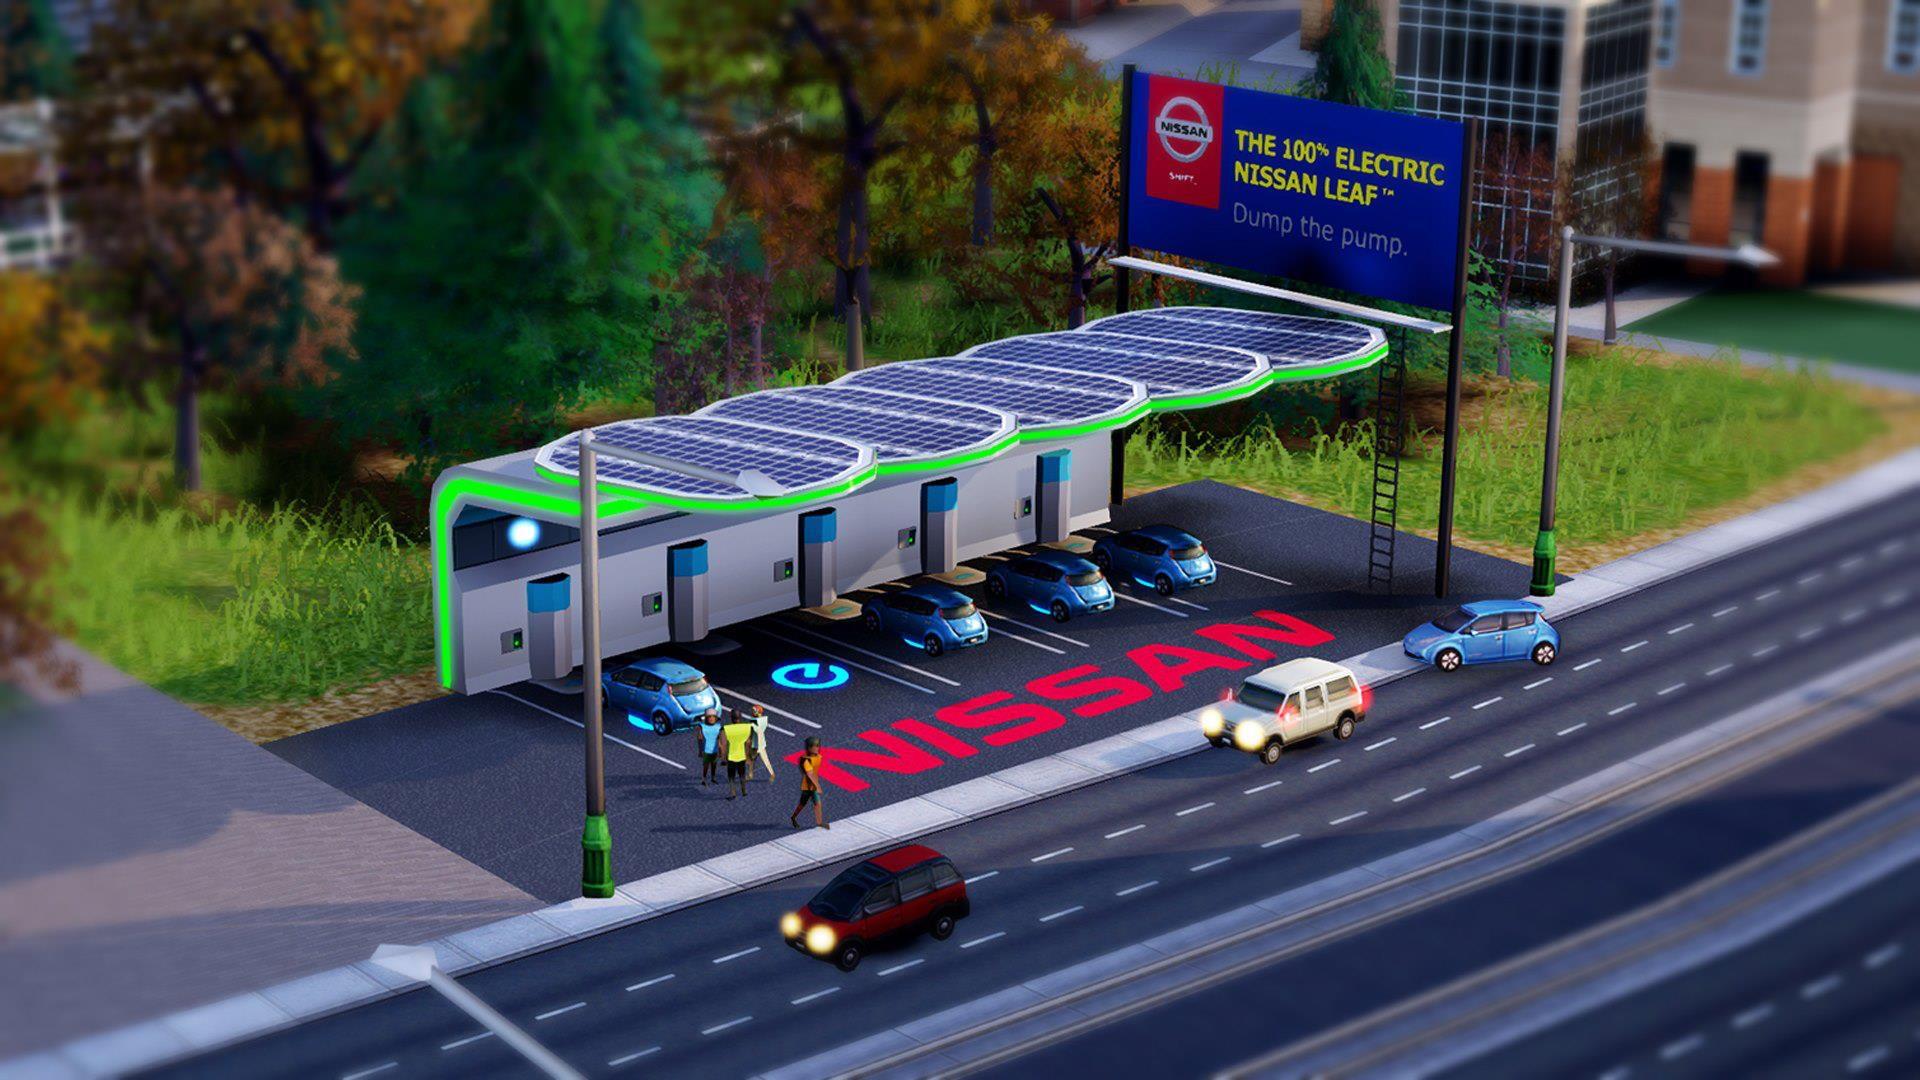 Nissan Leaf solar charging station on EA's SimCity game